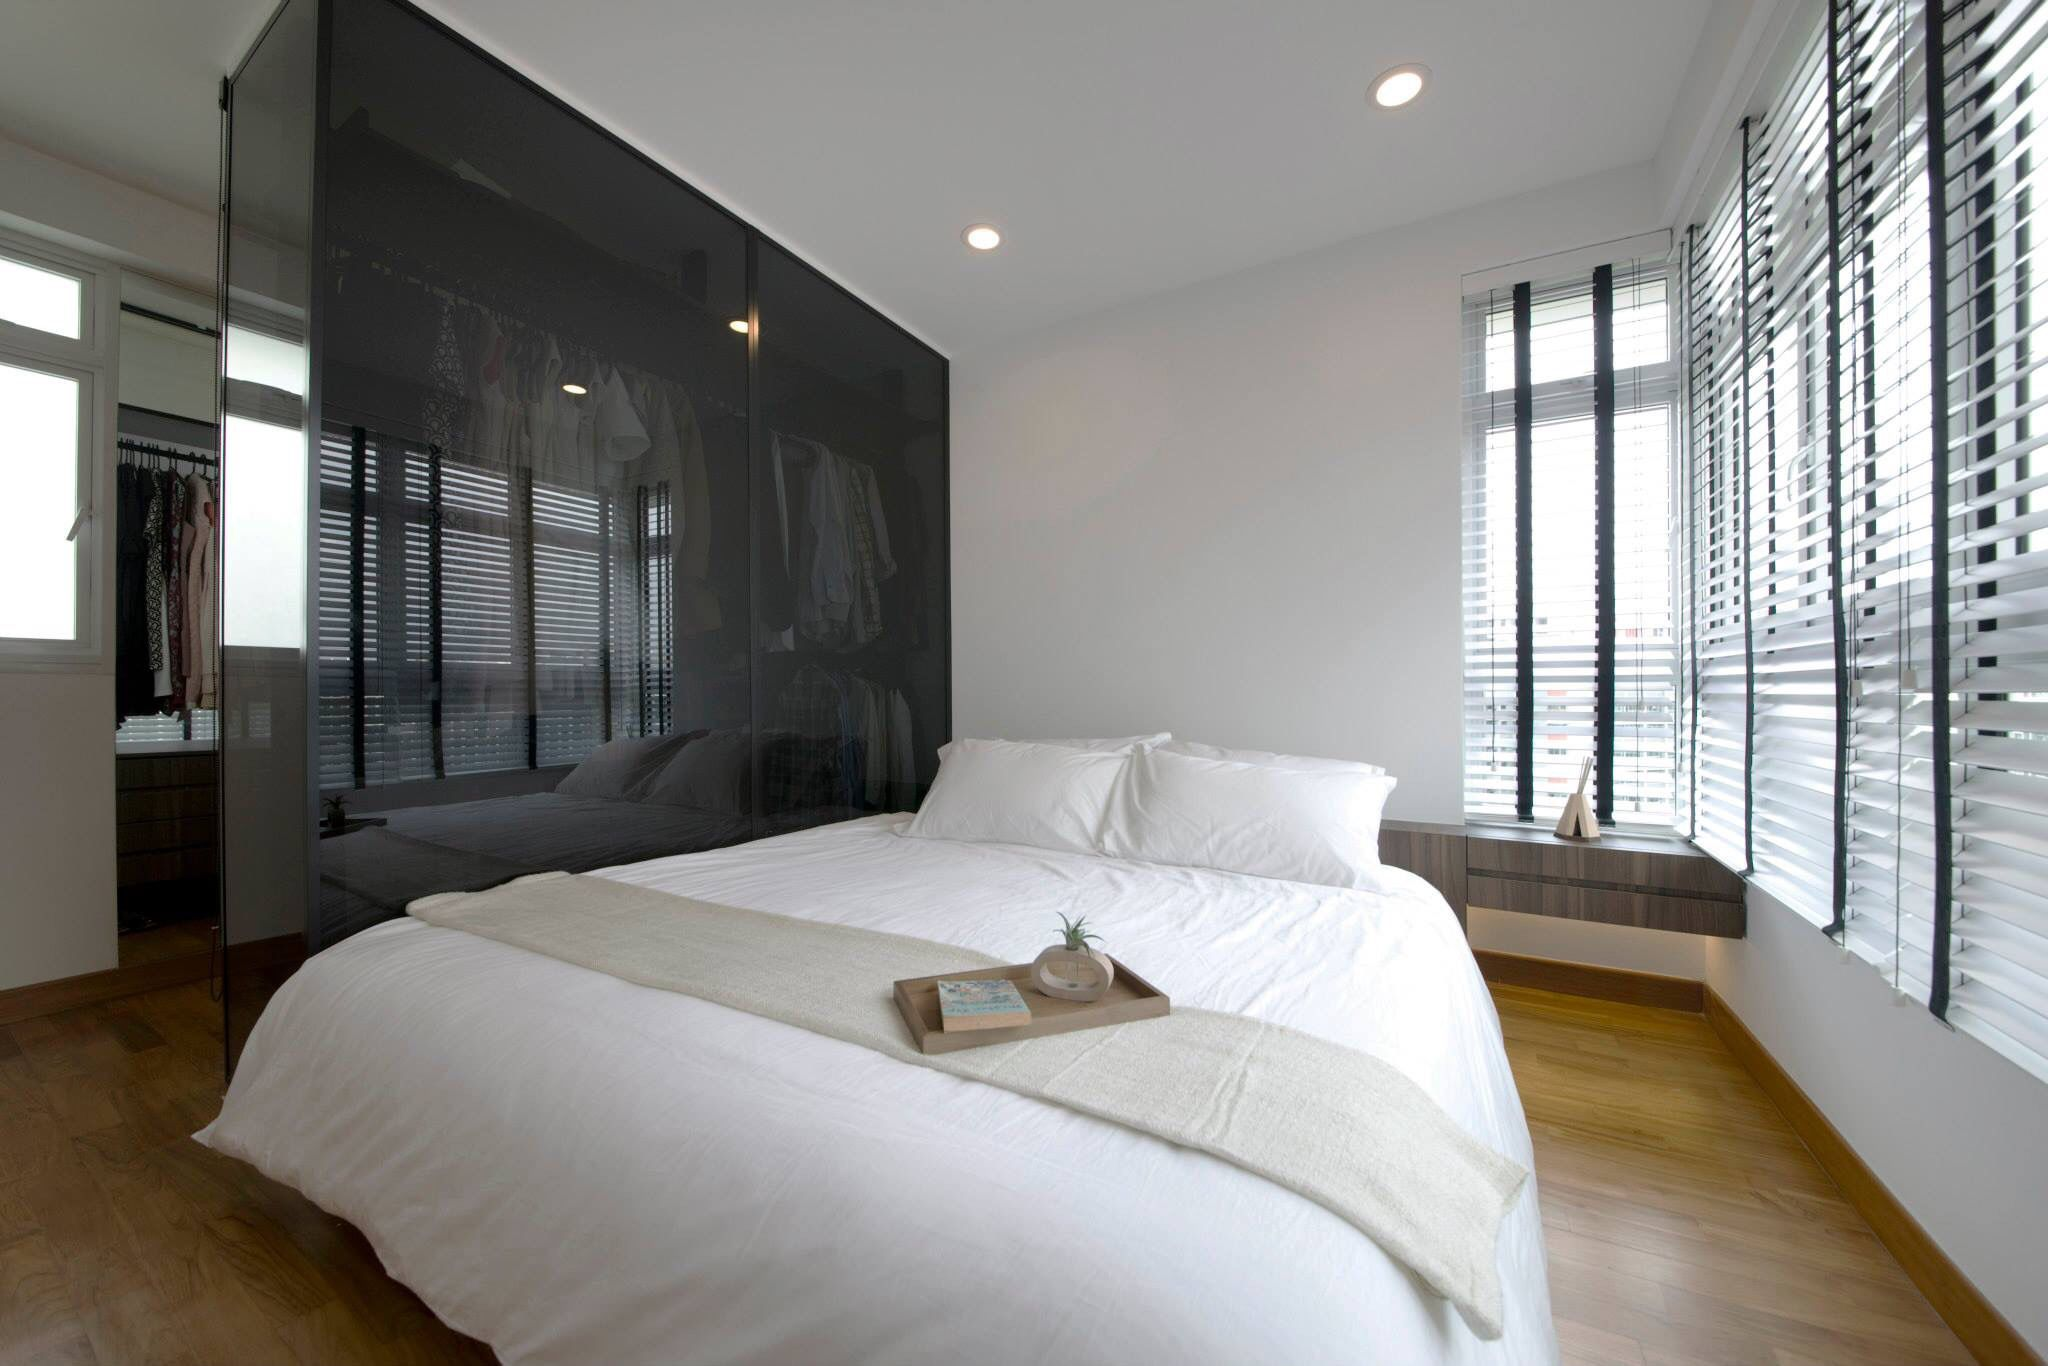 5 room hdb master bedroom design  Claudine Poh cdphy on Pinterest